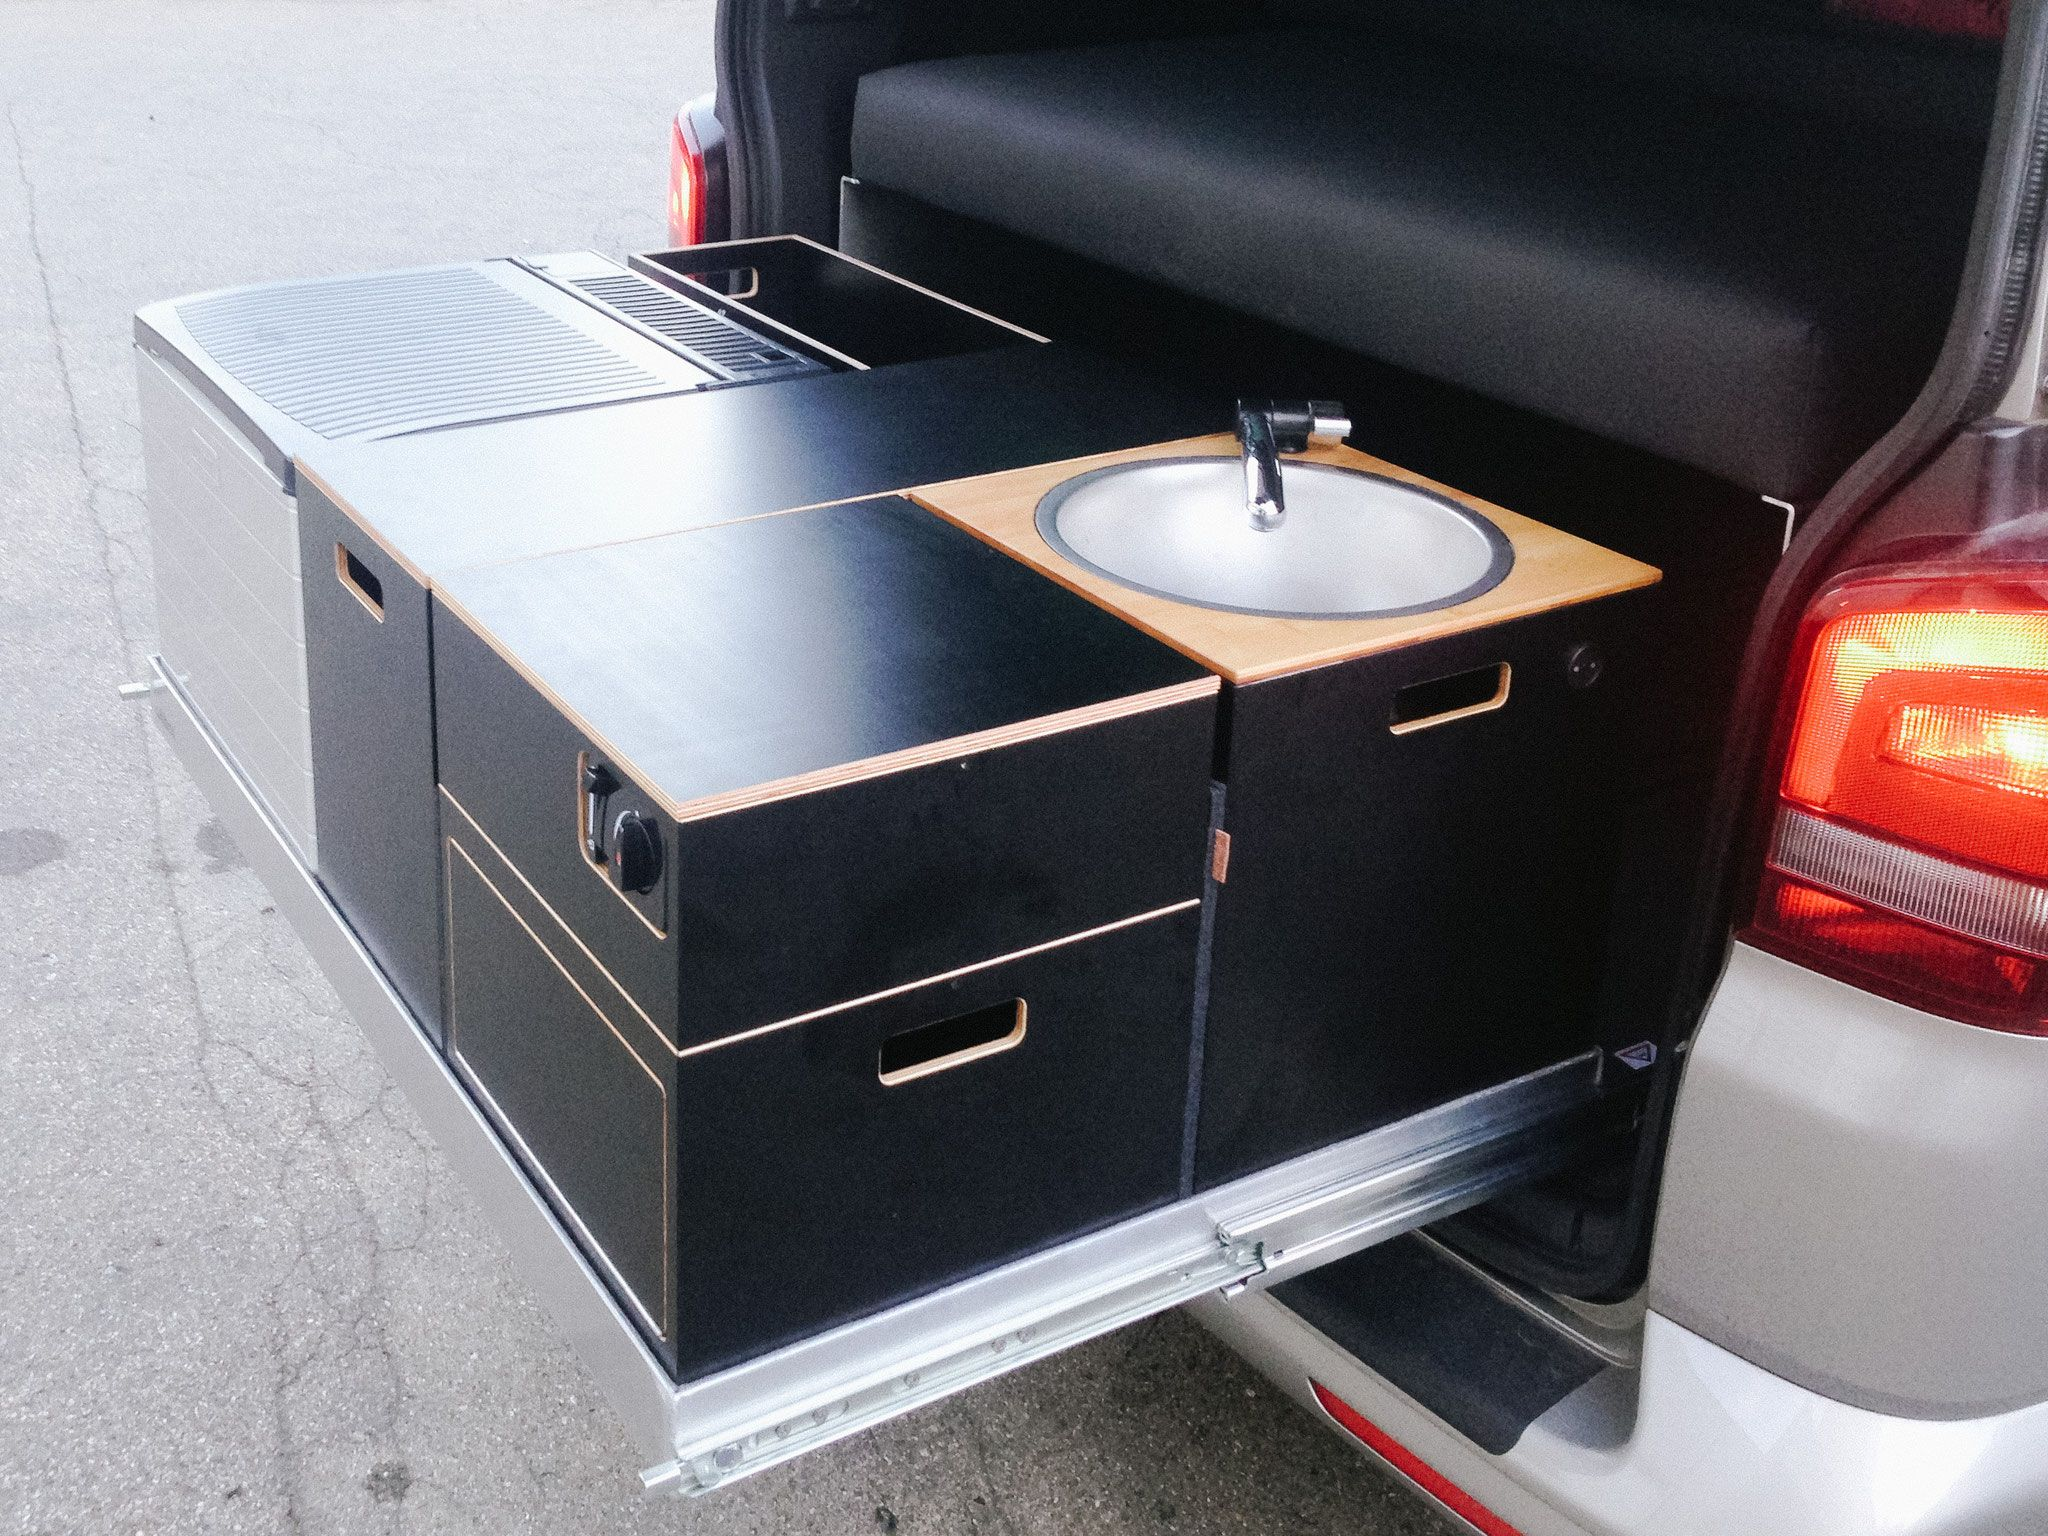 individuellen campingausbau f r kastenwagen und campingbus. Black Bedroom Furniture Sets. Home Design Ideas